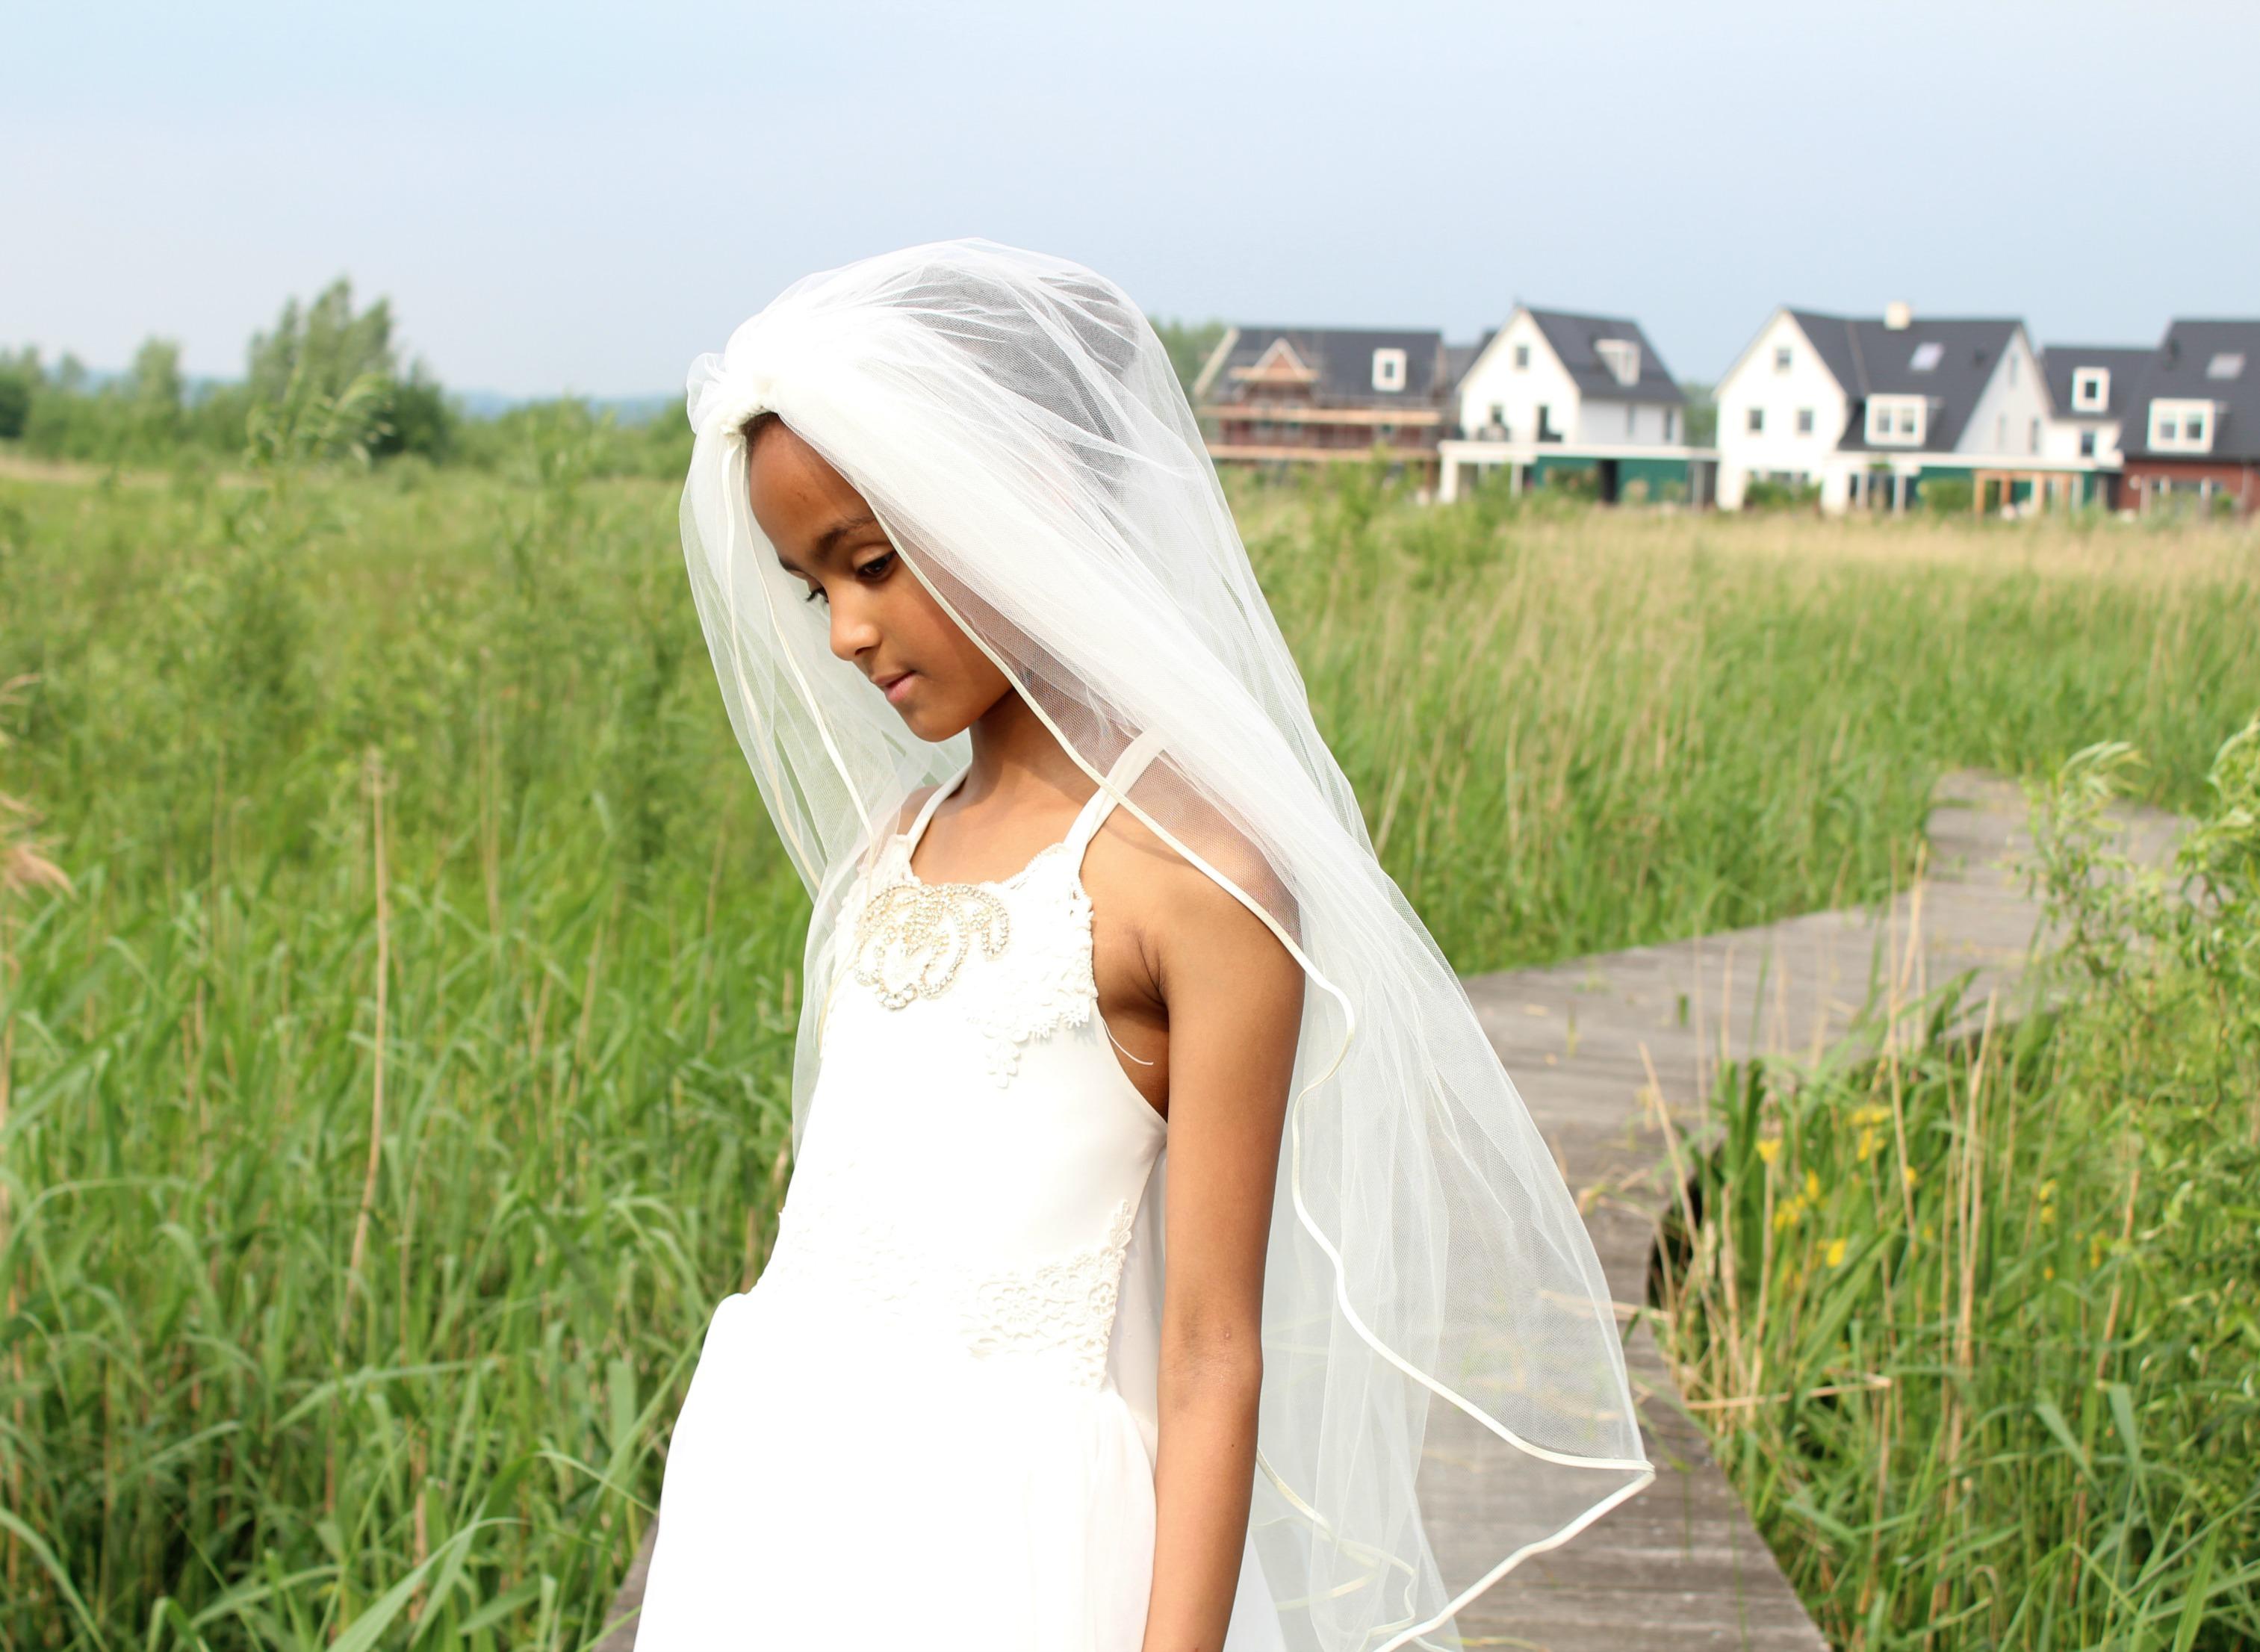 Dollcake Princess by night-bruidmeisjes jurk-GoodGirlsCompany-special occasion dress